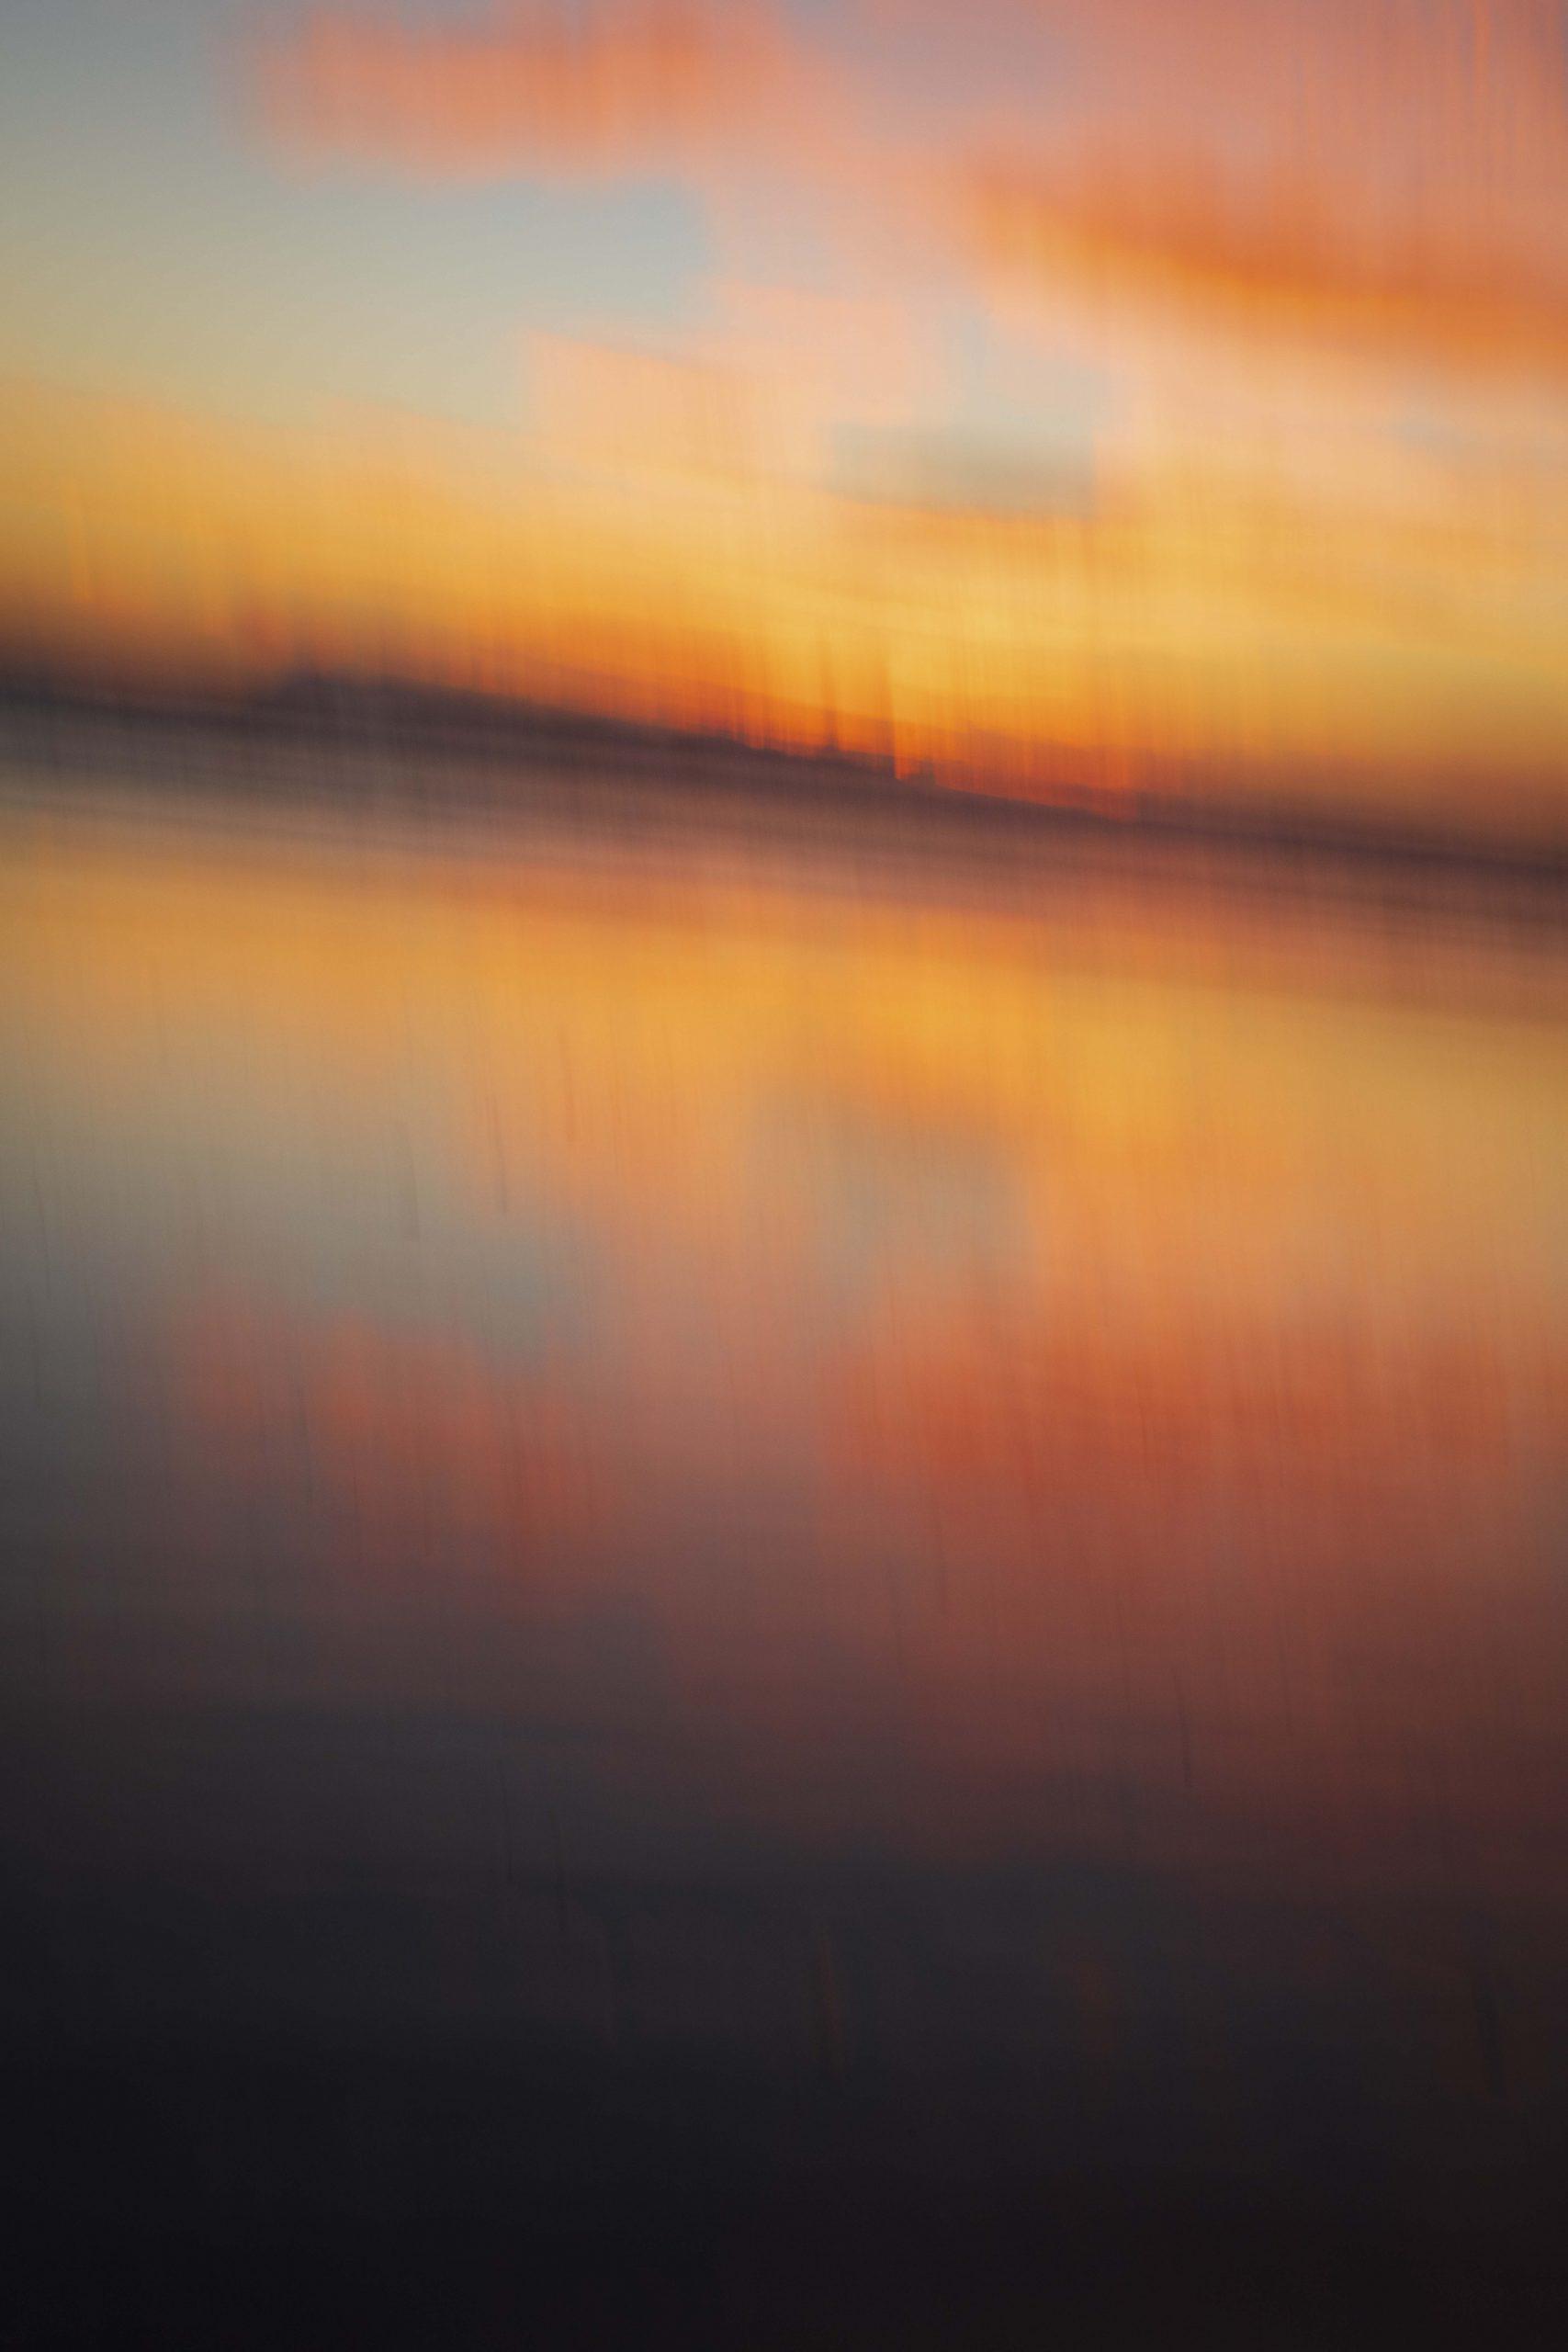 sunset, William Turner, abstract, landscape, ocean, beach, orange,